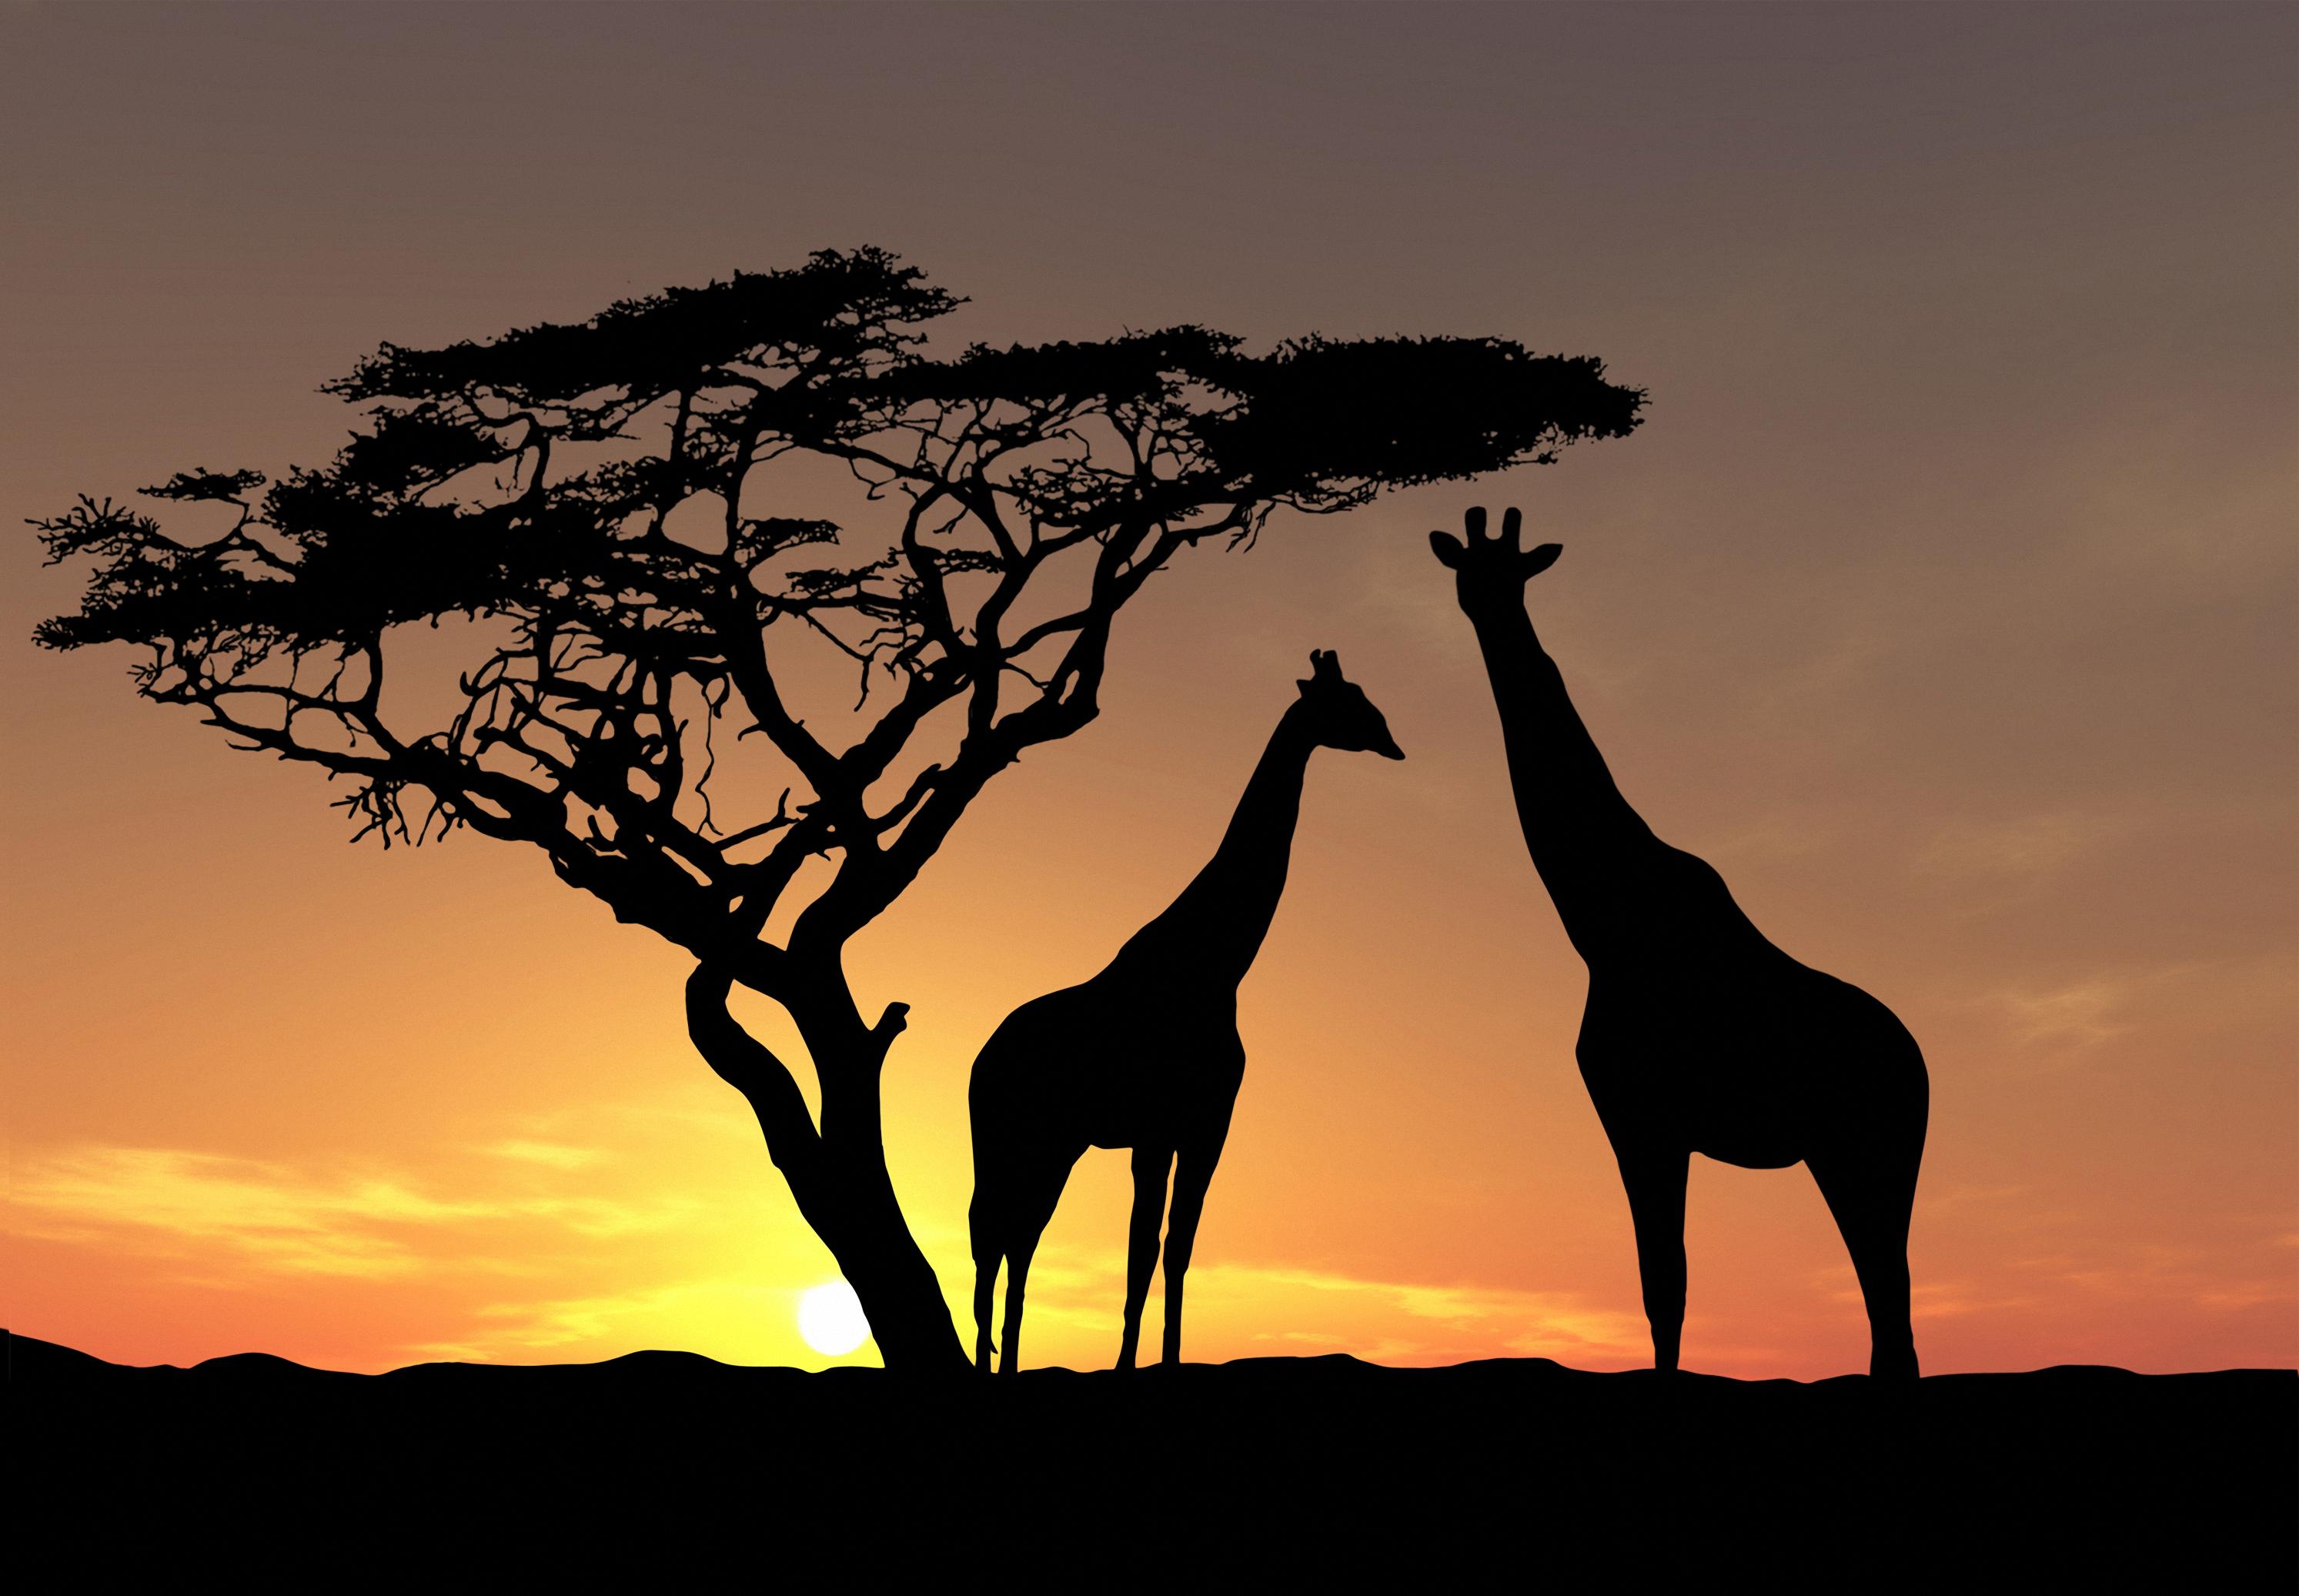 Giraffe 2987x2074